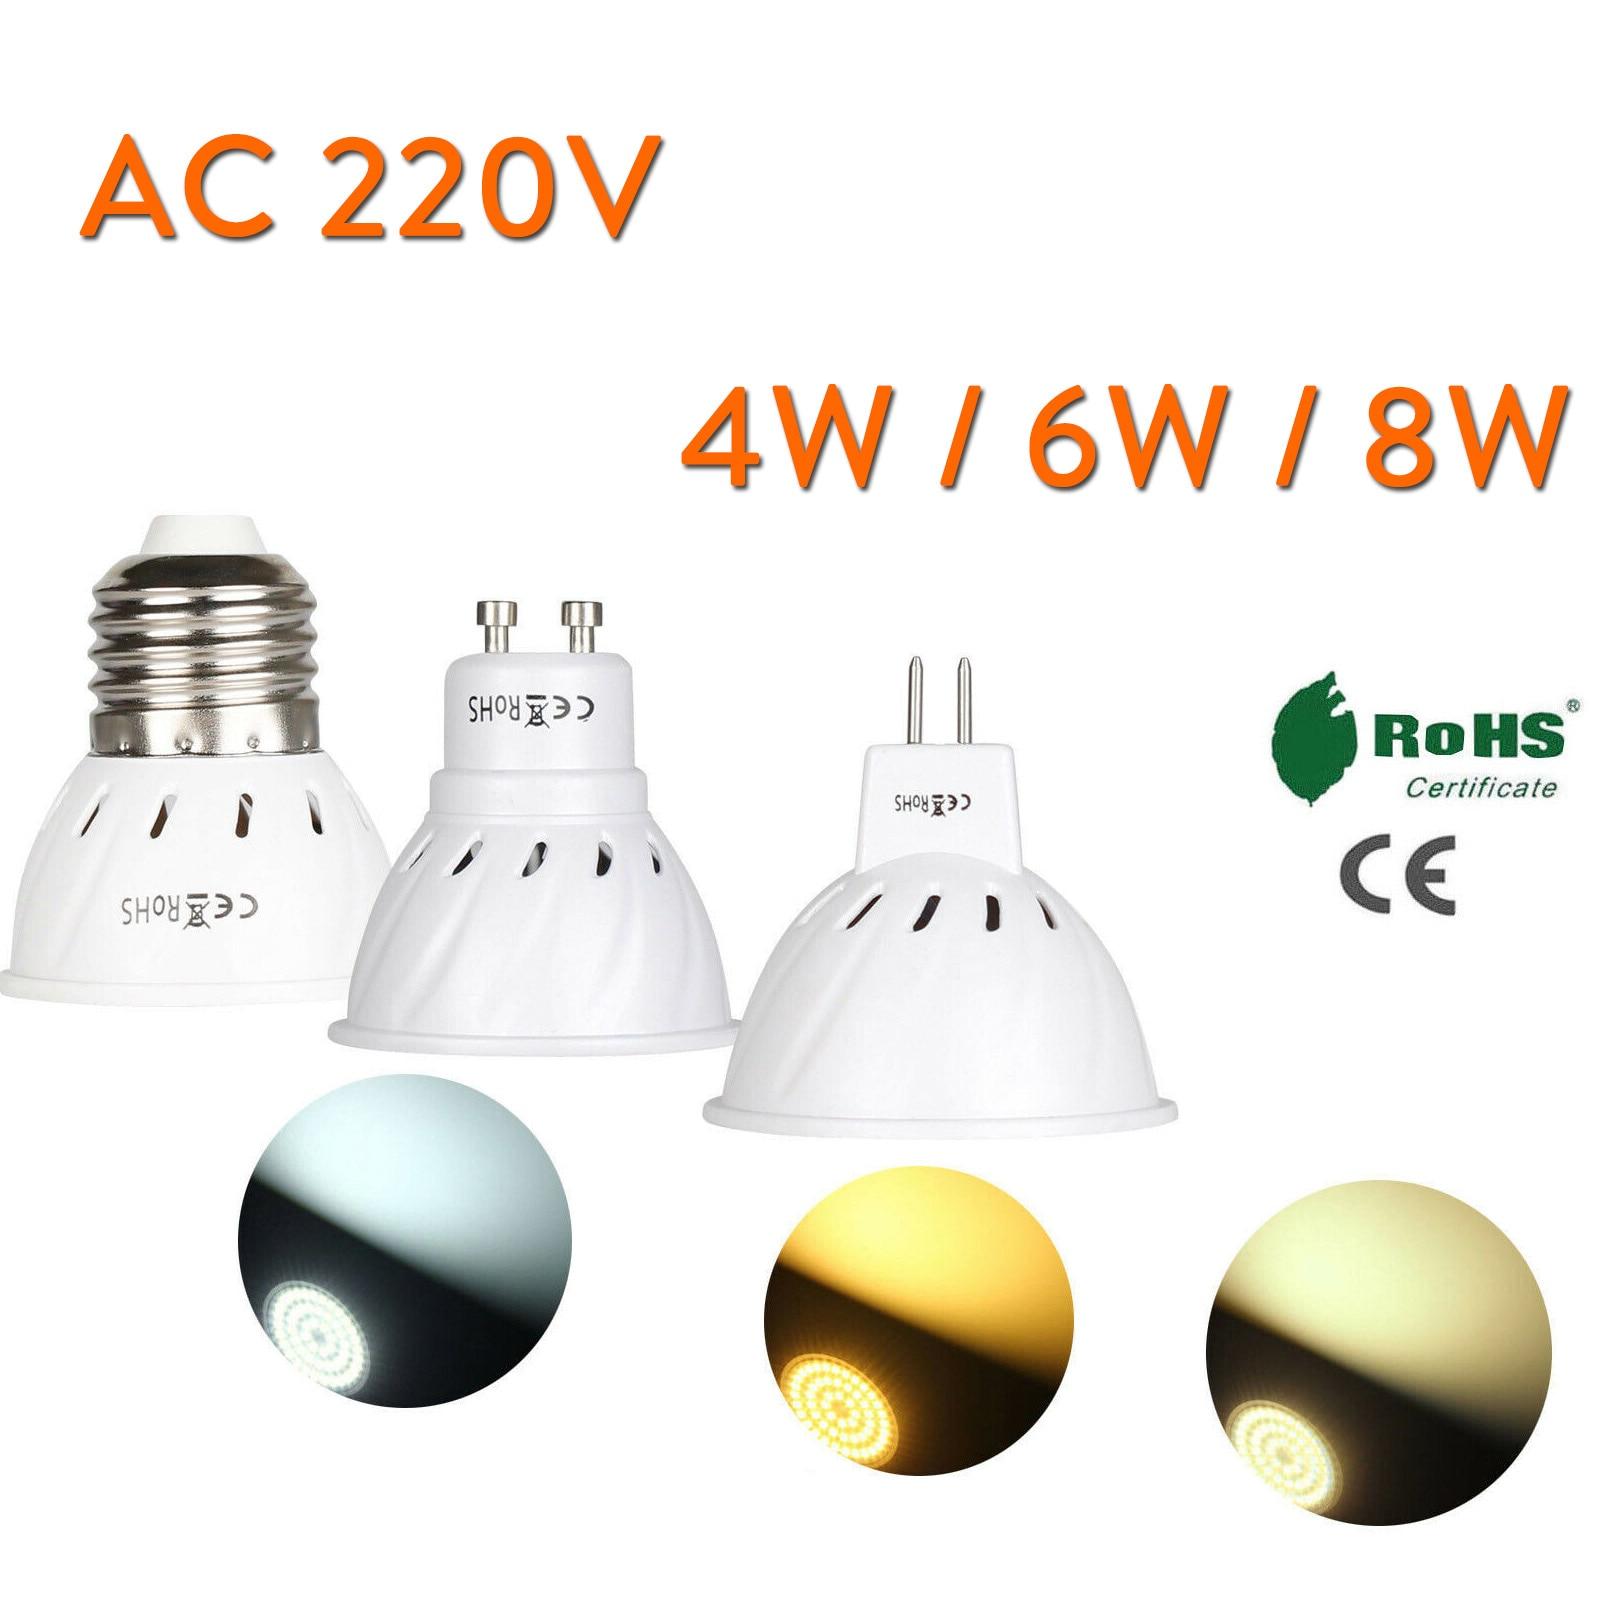 4W 6W 8W GU10 E27 MR16 220V LED Lamp Spotlight Bulb 36 54 72 Leds Lampara GU 10 Bombillas Lampada Spot Light Lamps Save Energy